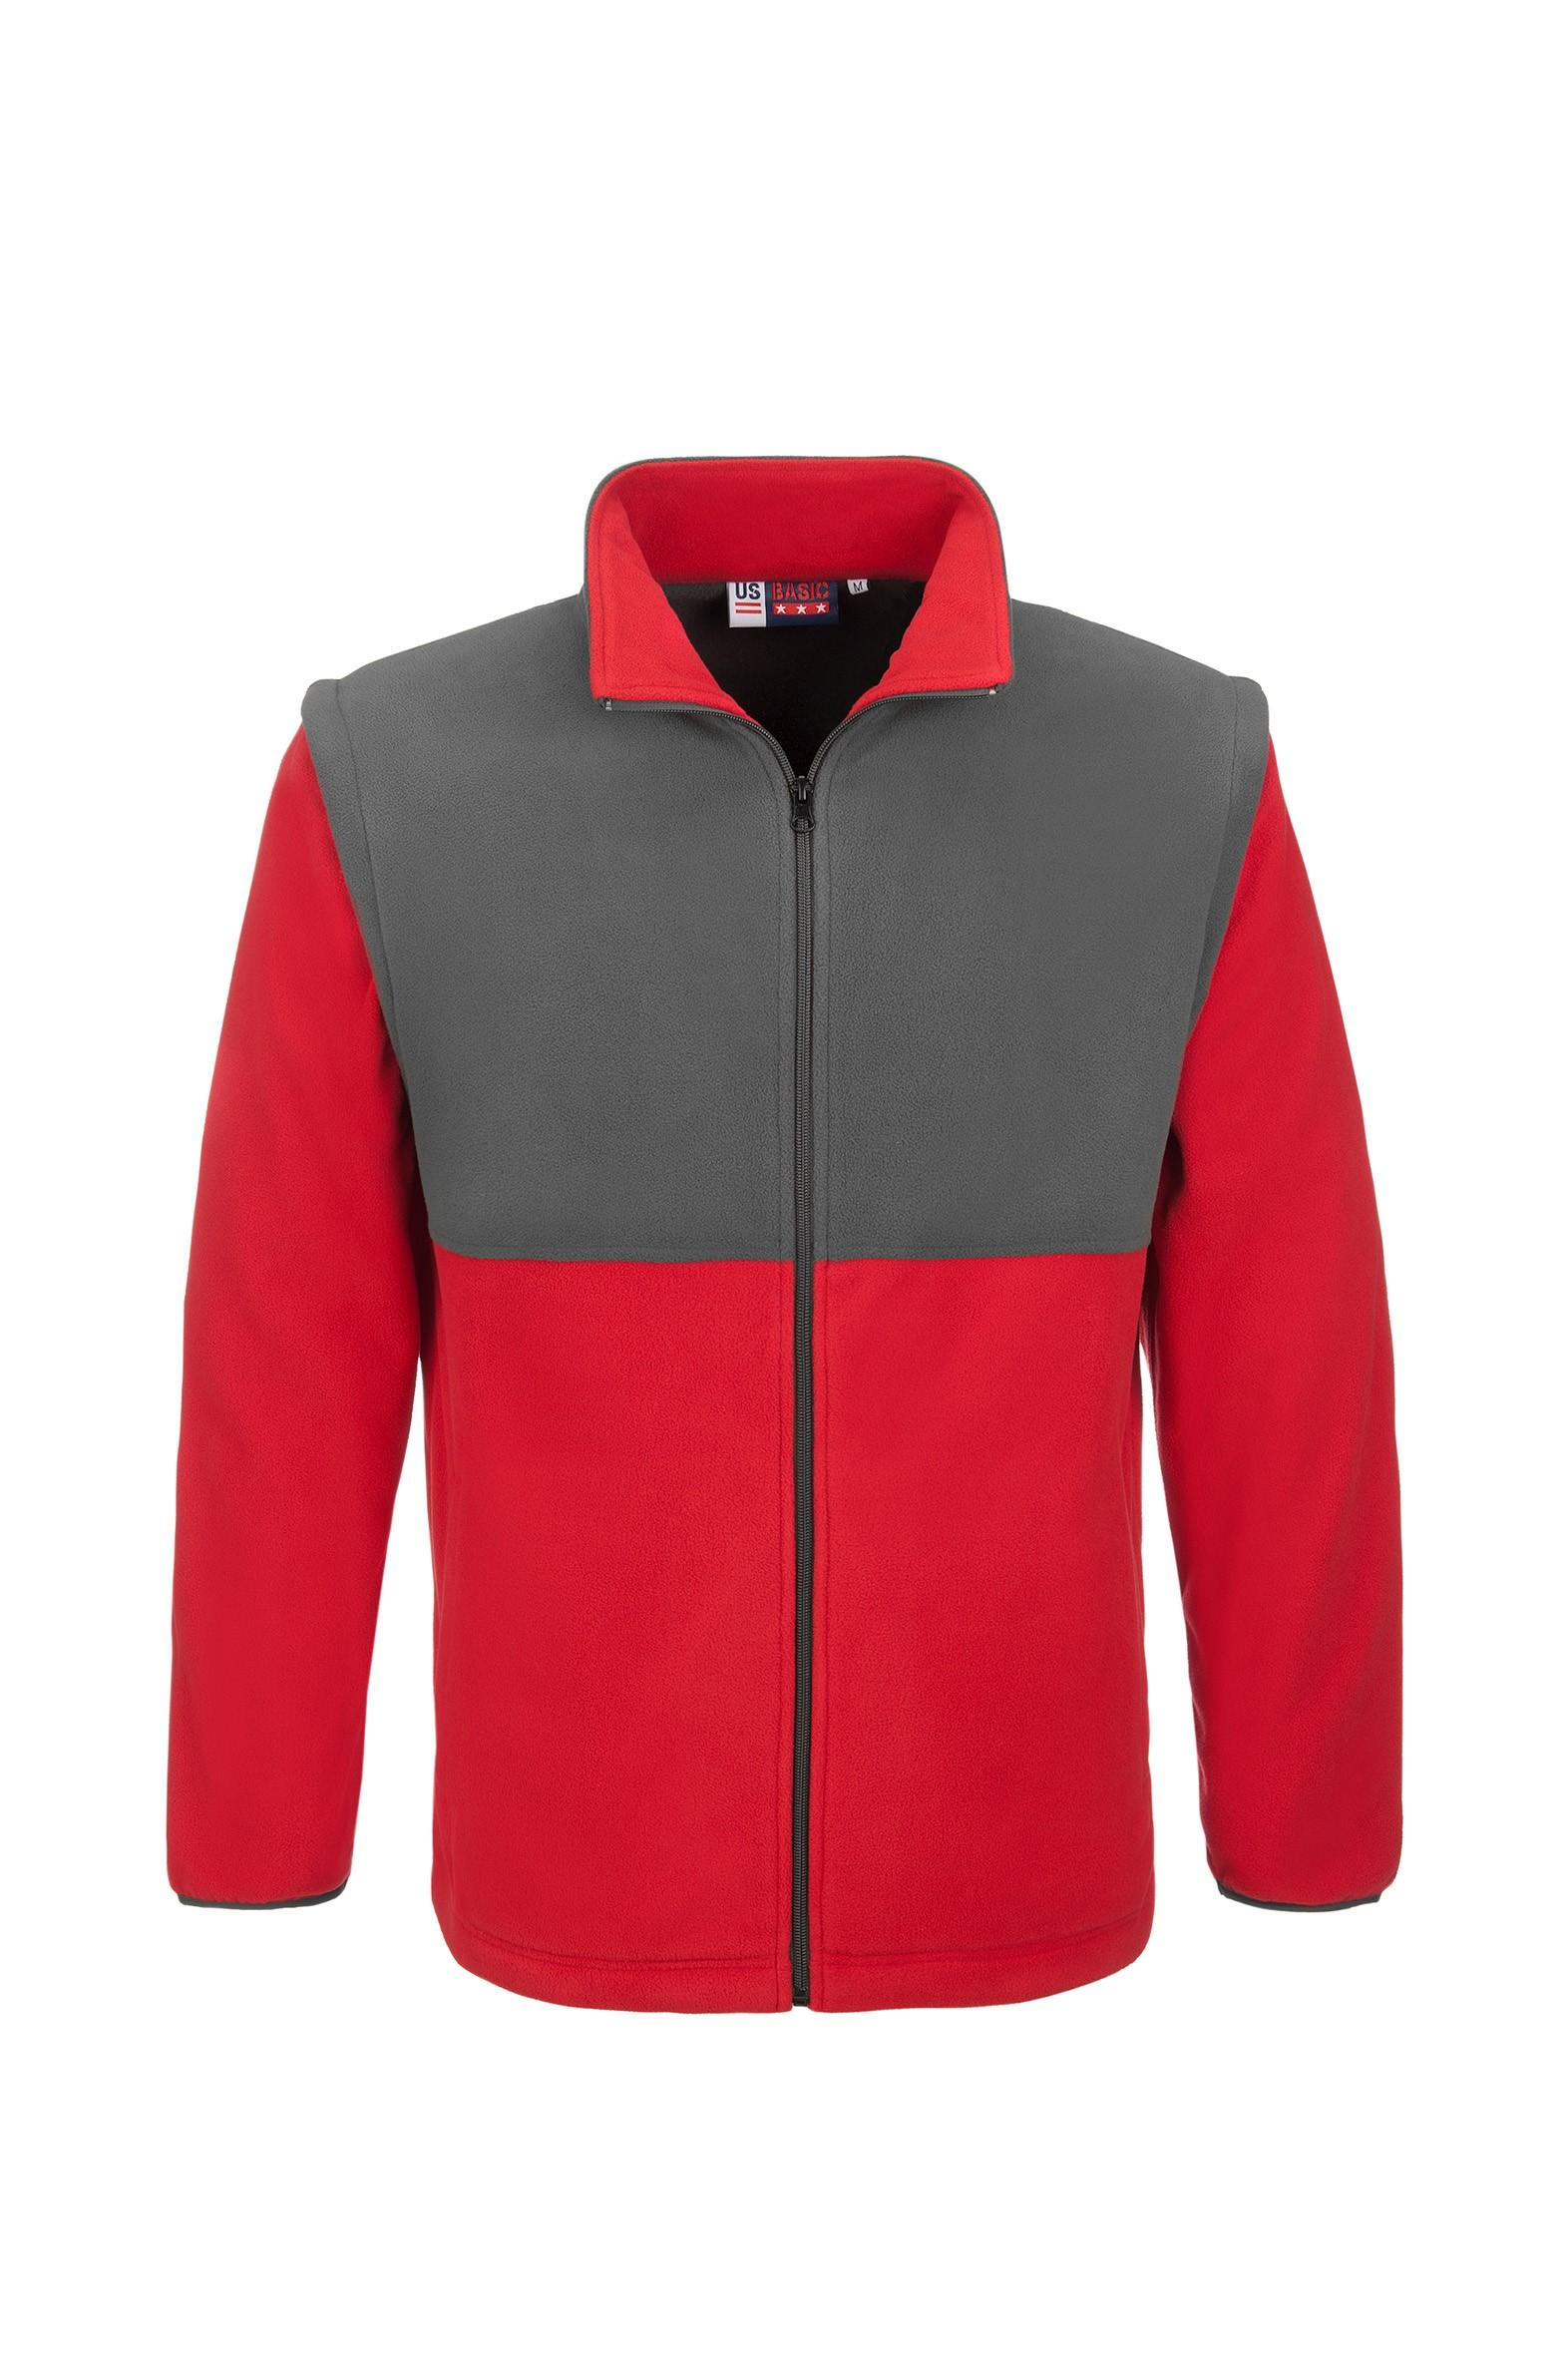 Mens Benneton Zip-off Micro Fleece Jacket - Red Only